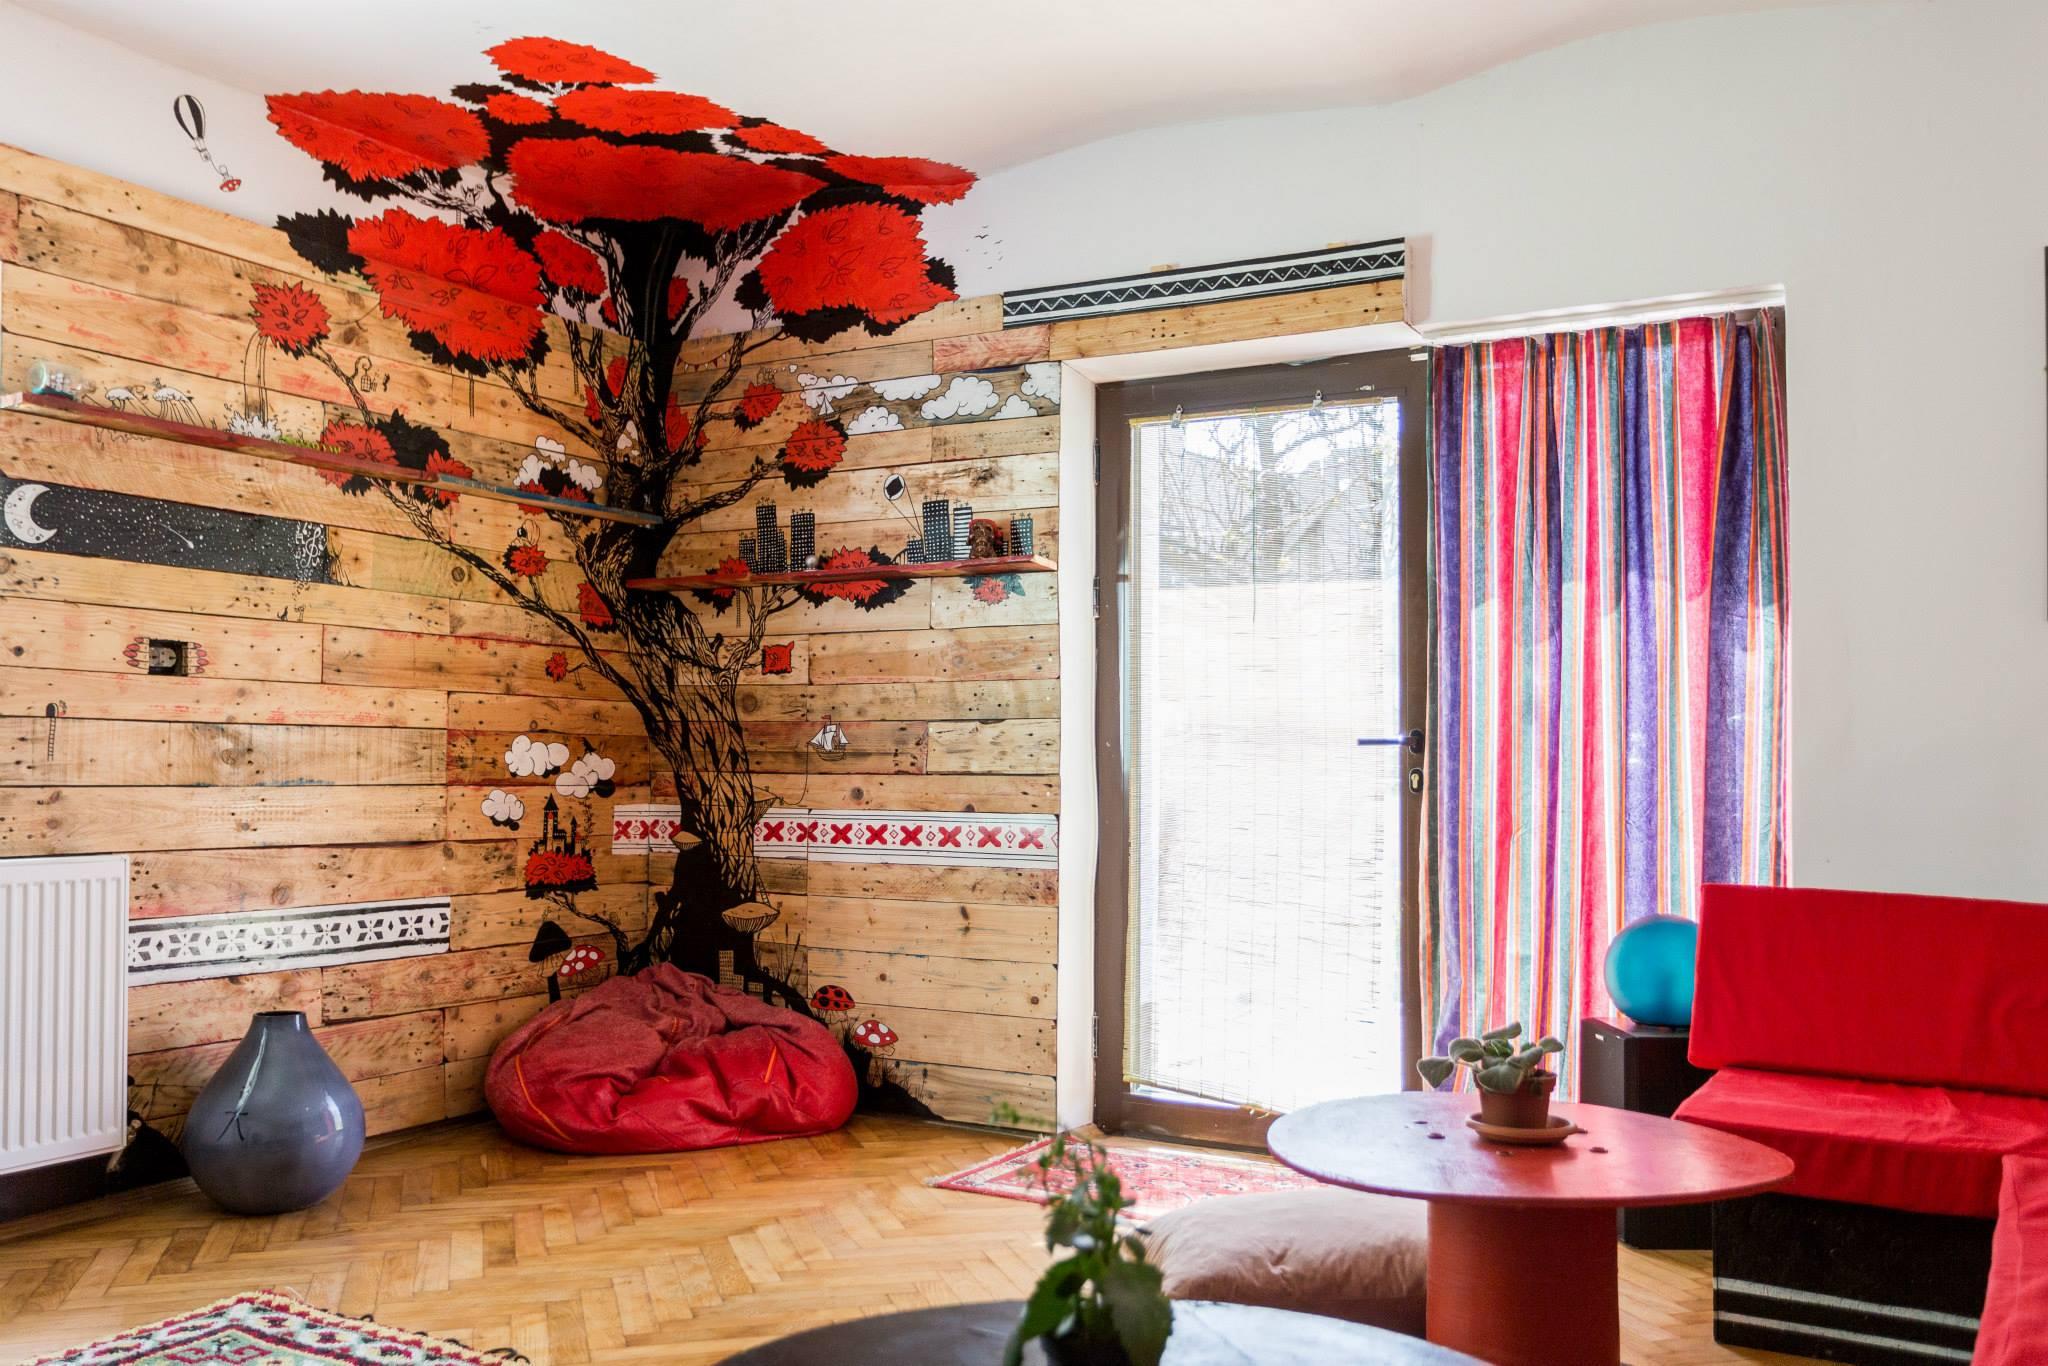 proprietarii the spot cosy hostel (2)